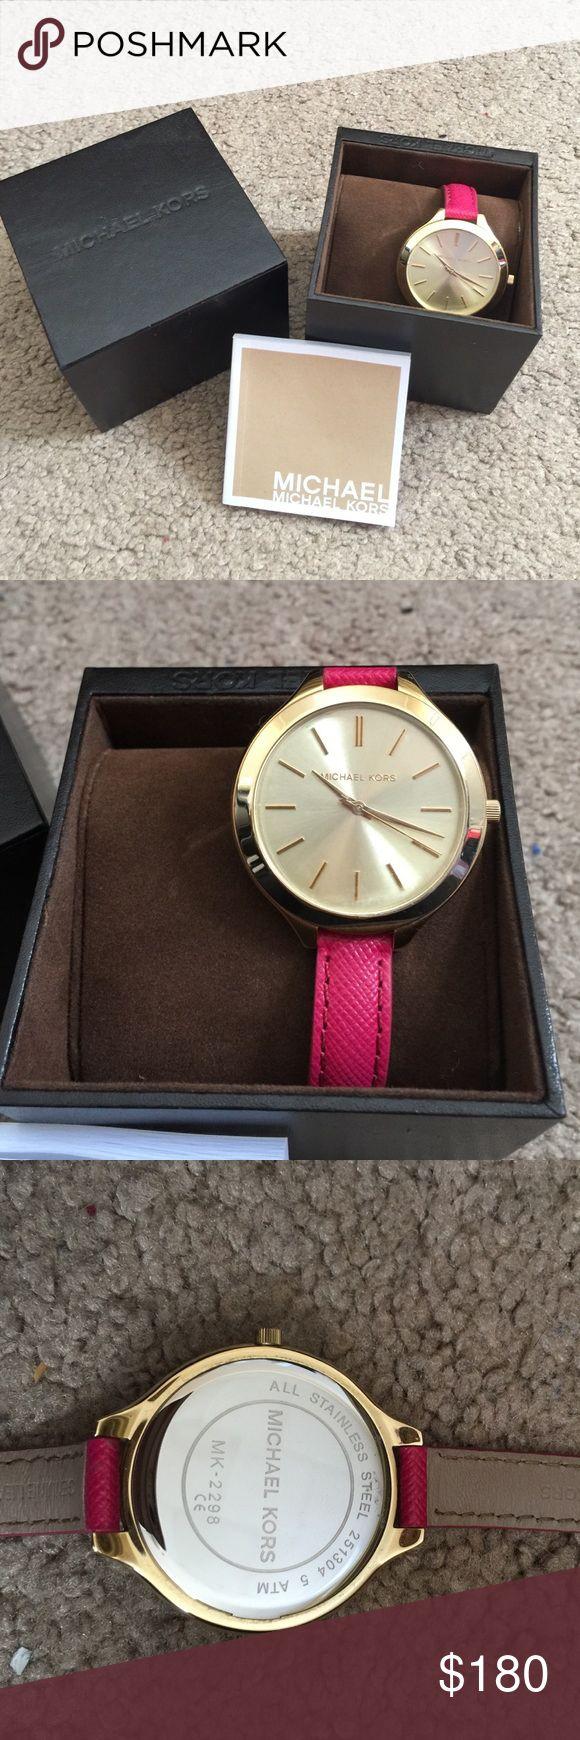 Brand new Michael Kors watch Brand new Michael Kors watch. Pink leather band. Michael Kors Accessories Watches